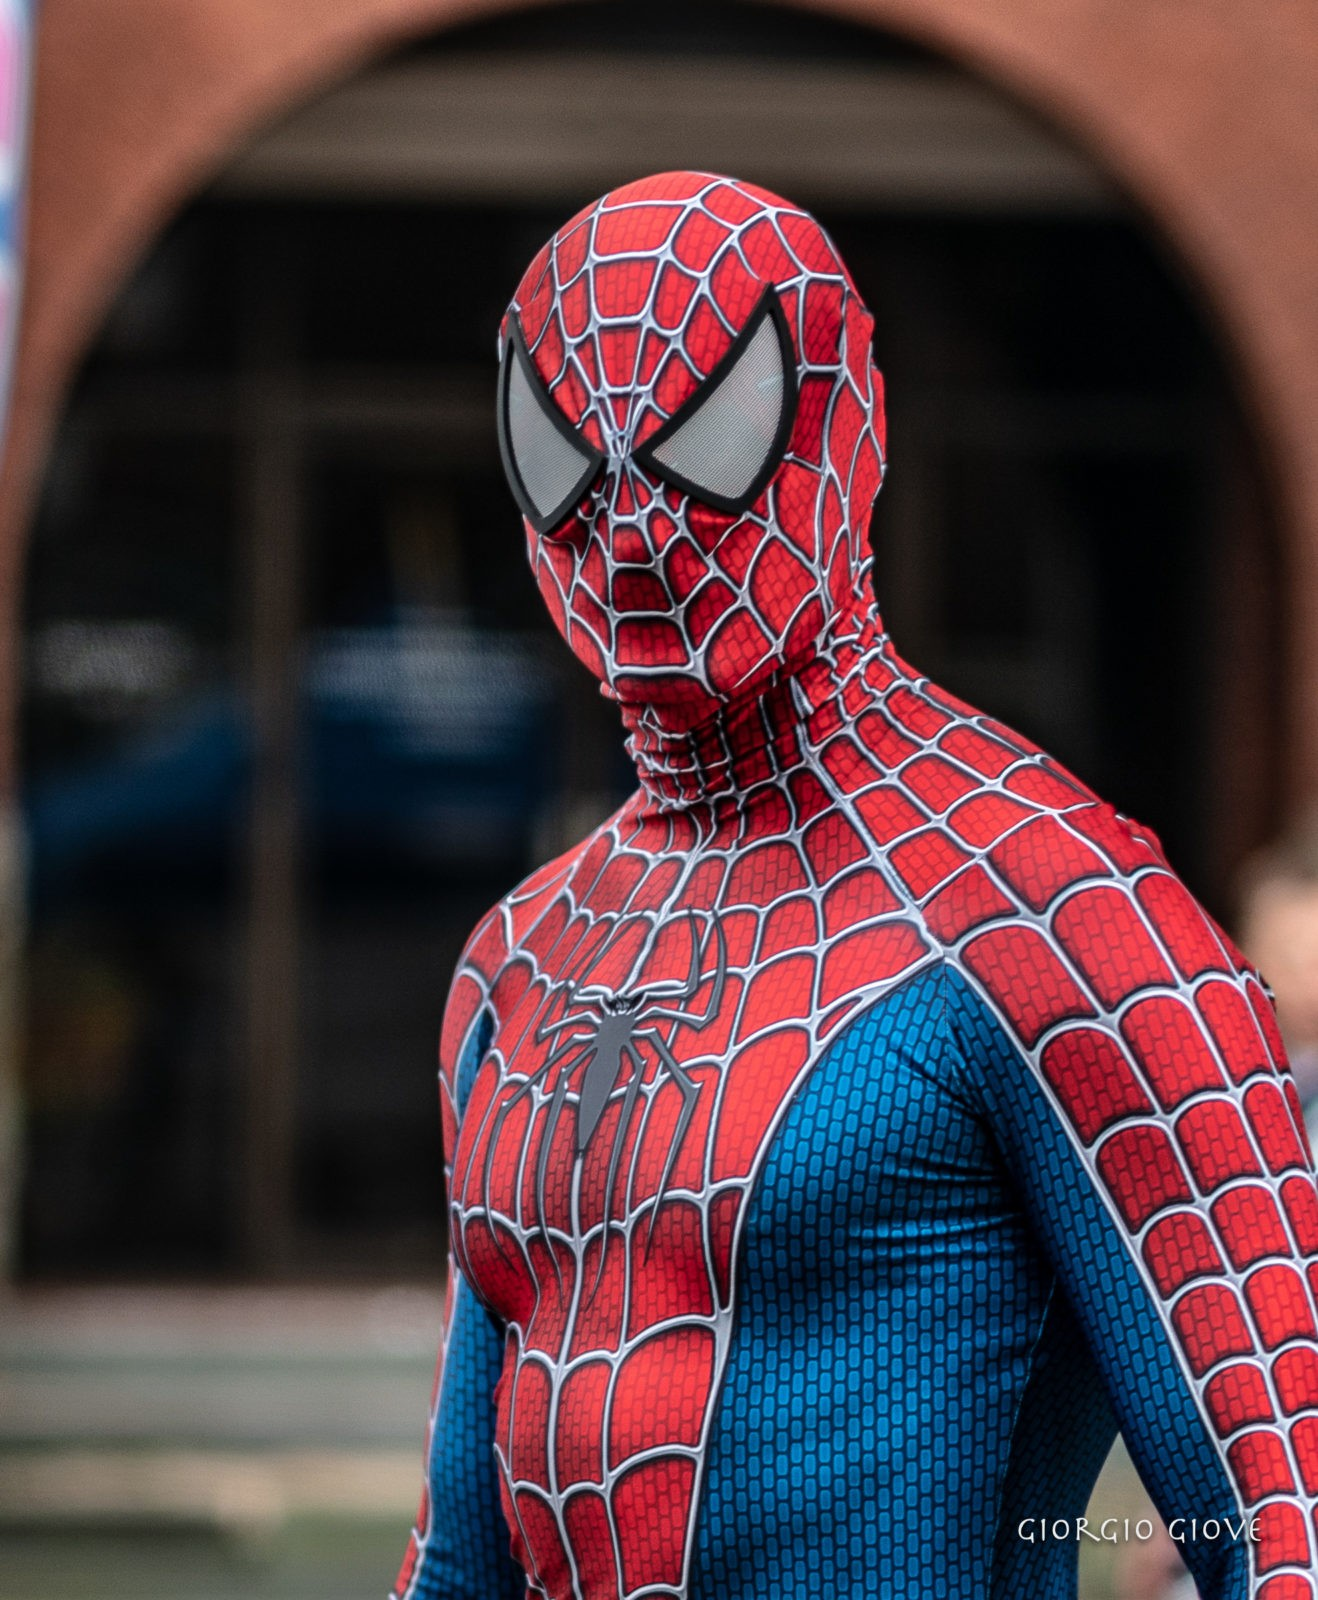 Spider man at looking good